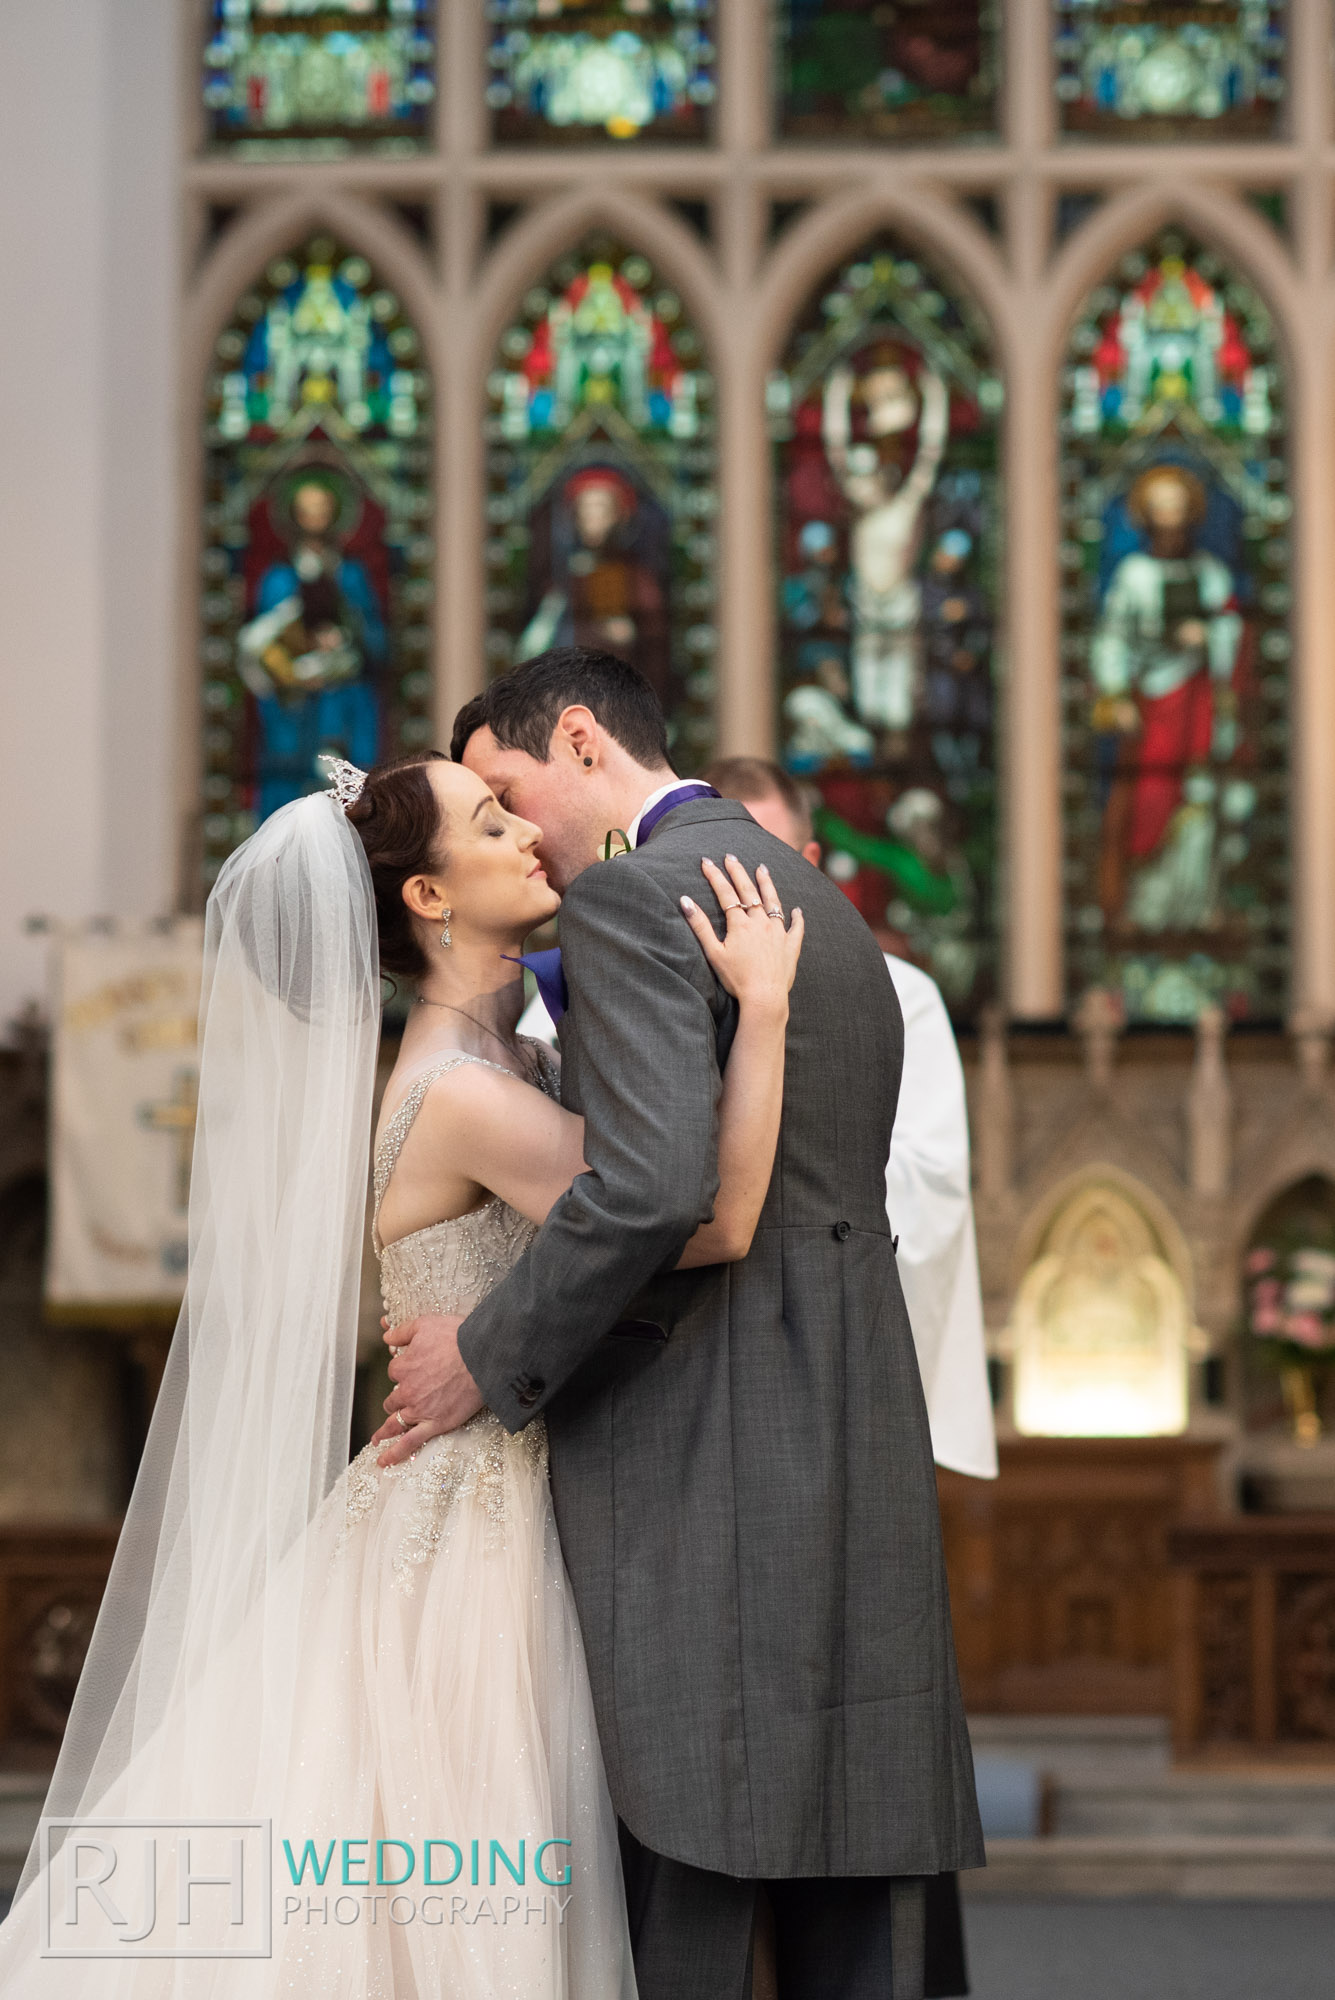 Oulton Hall Wedding Photography_Goodwill-Hall_024_DSC_3332.jpg